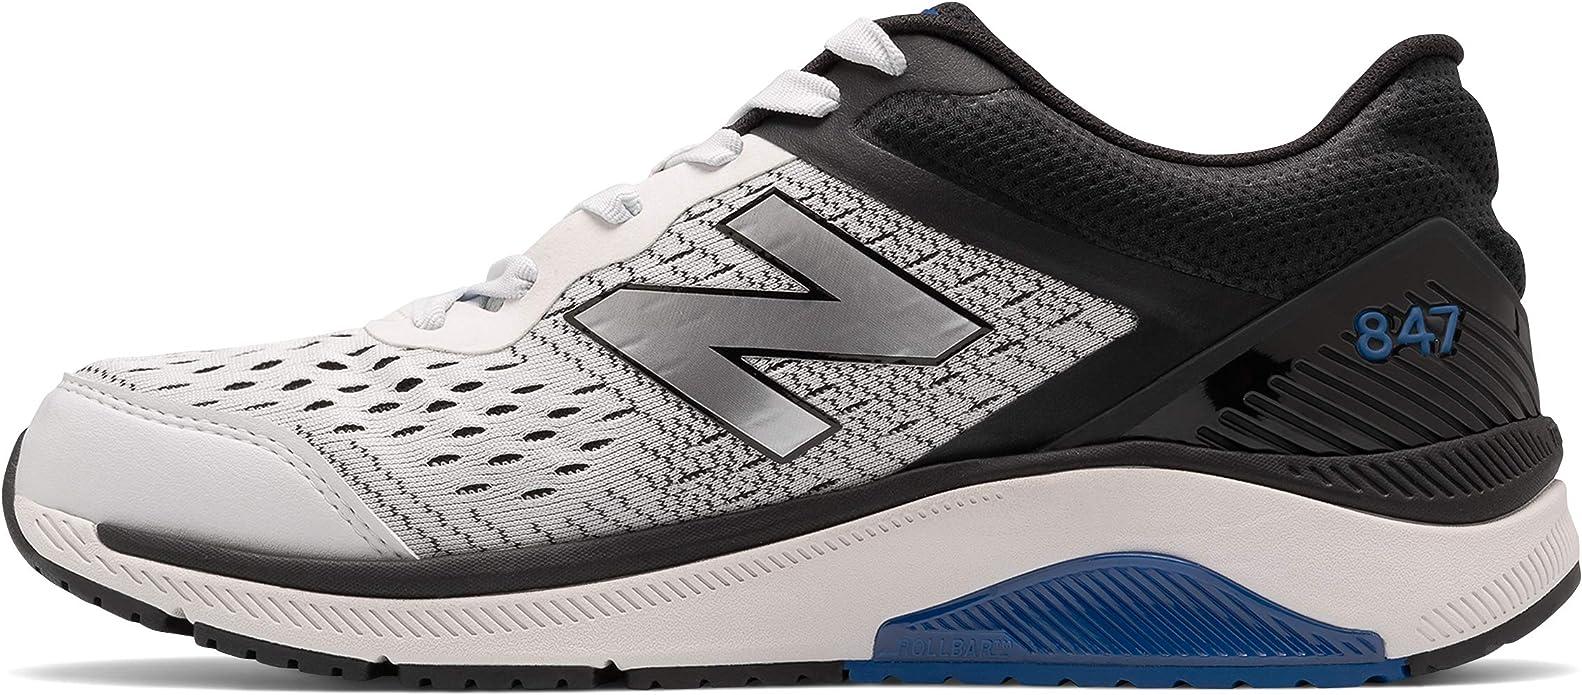 New Balance Men's 847 V4 Walking Shoe